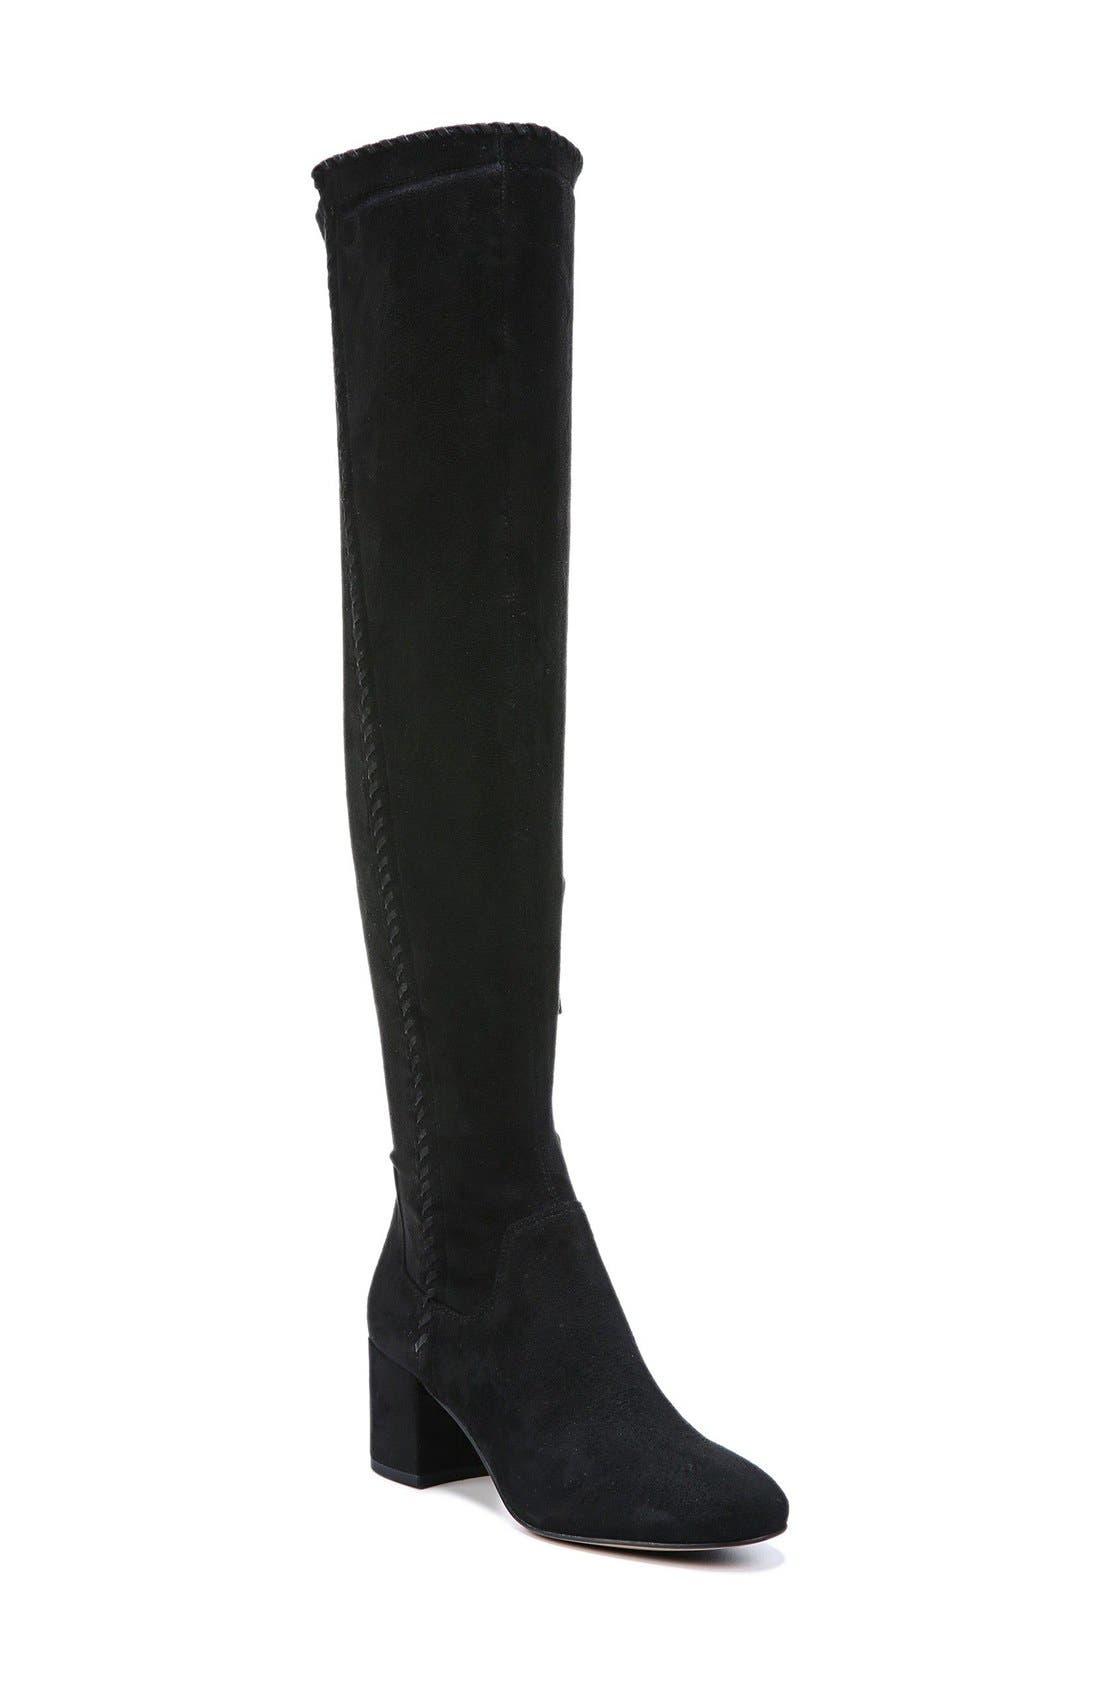 Alternate Image 1 Selected - SARTO by Franco Sarto Kayda Tall Stretch Boot (Women)